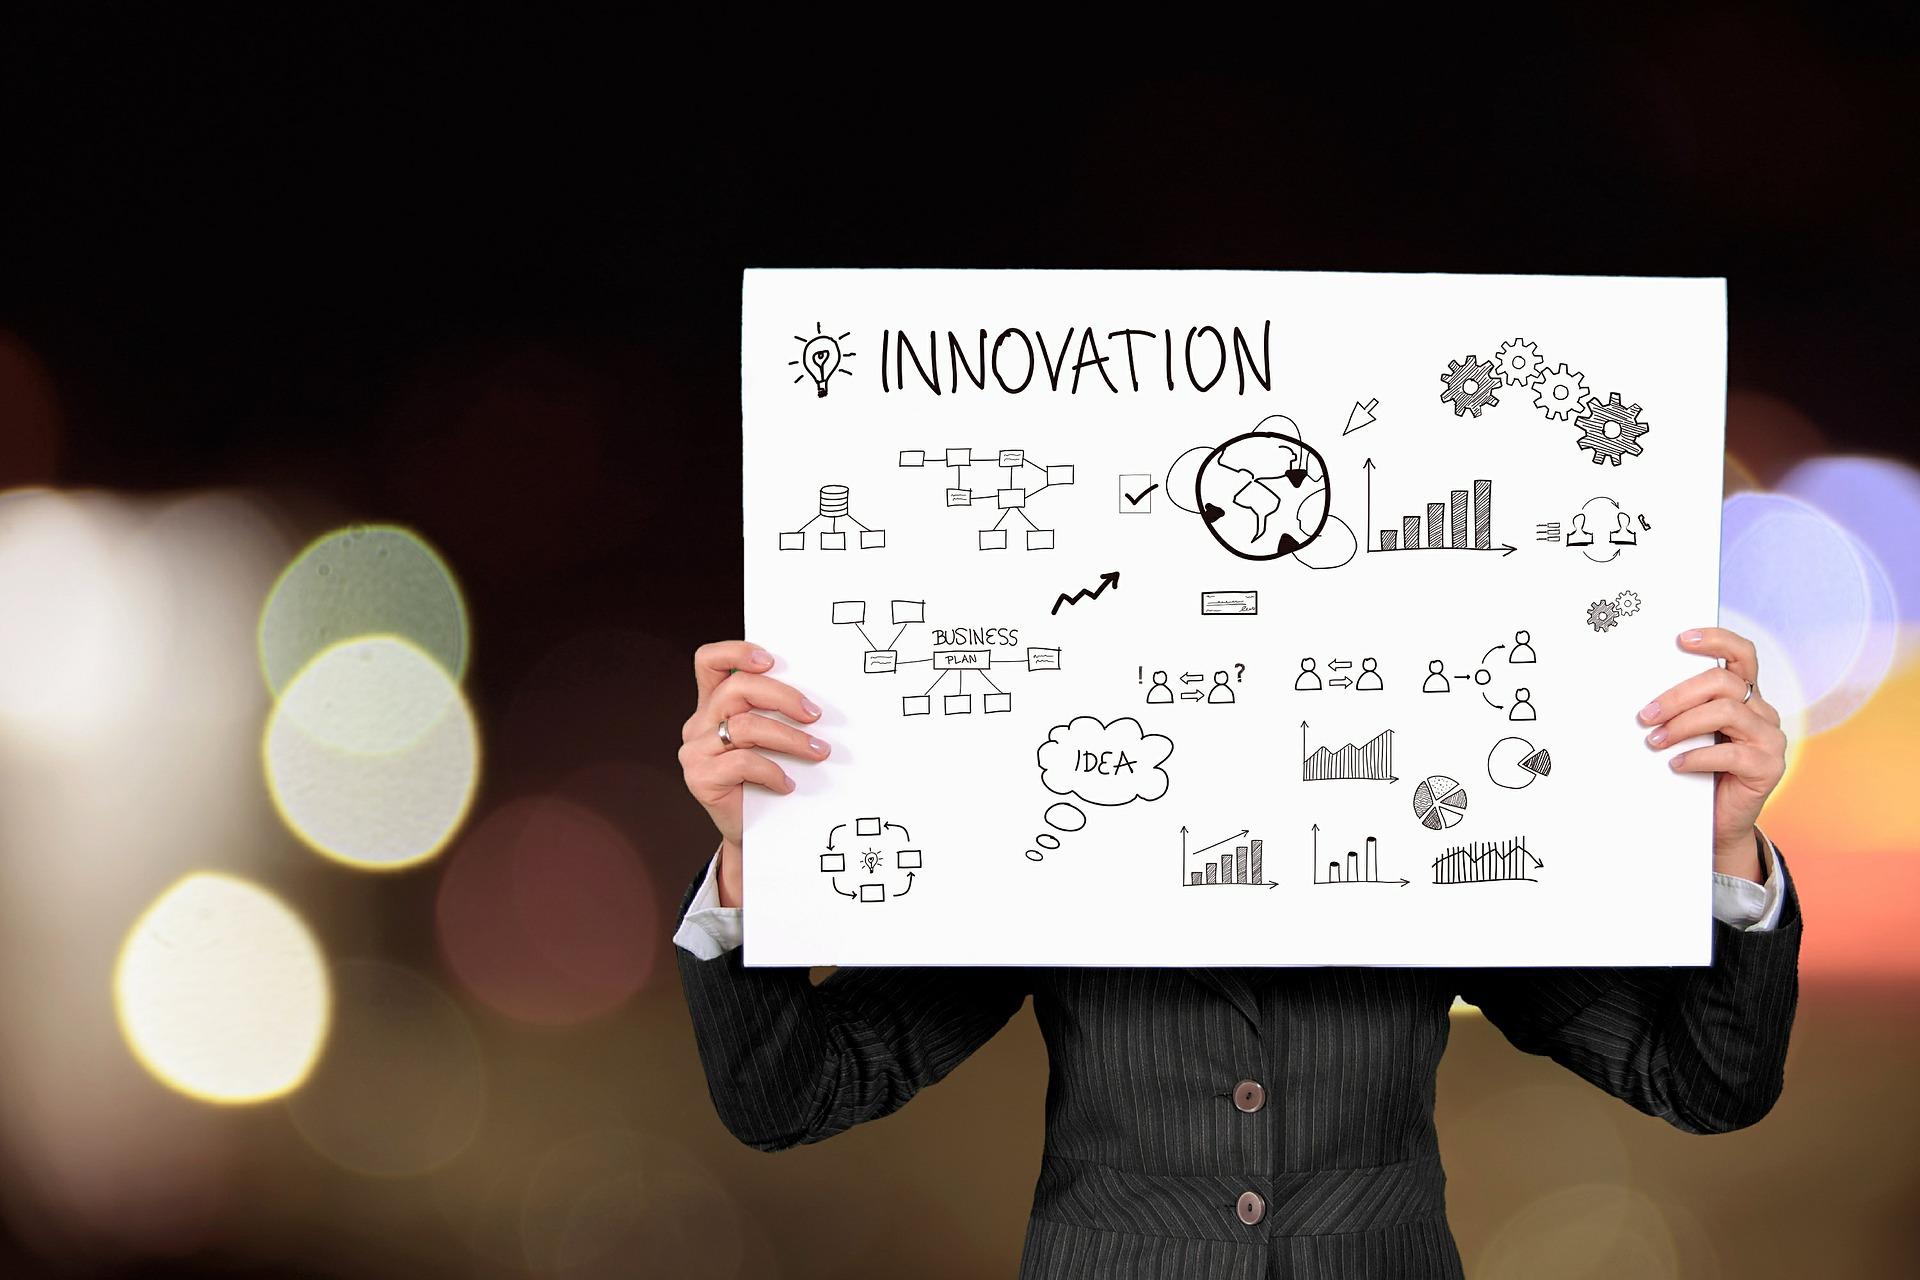 Innovation, photo: jarmoluk@pixabay